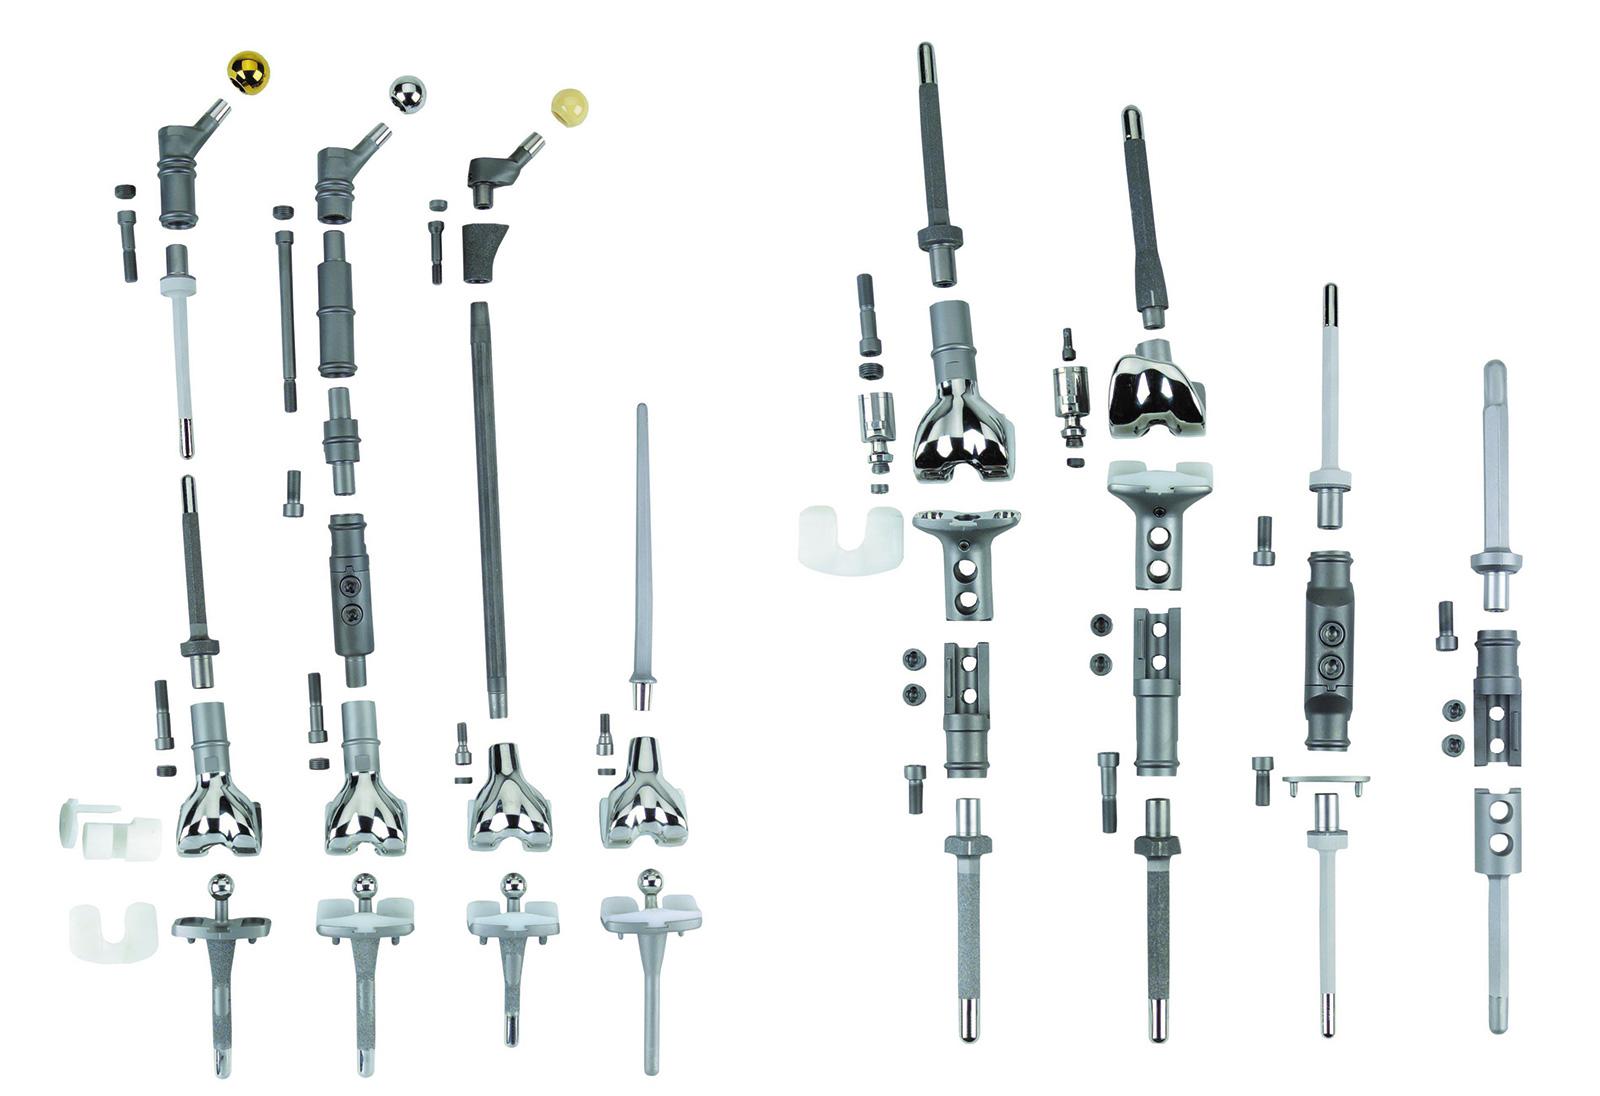 Abb. 8-7: MUTARS-Tumorprothese der Firma Implantcast (Buxtehude)